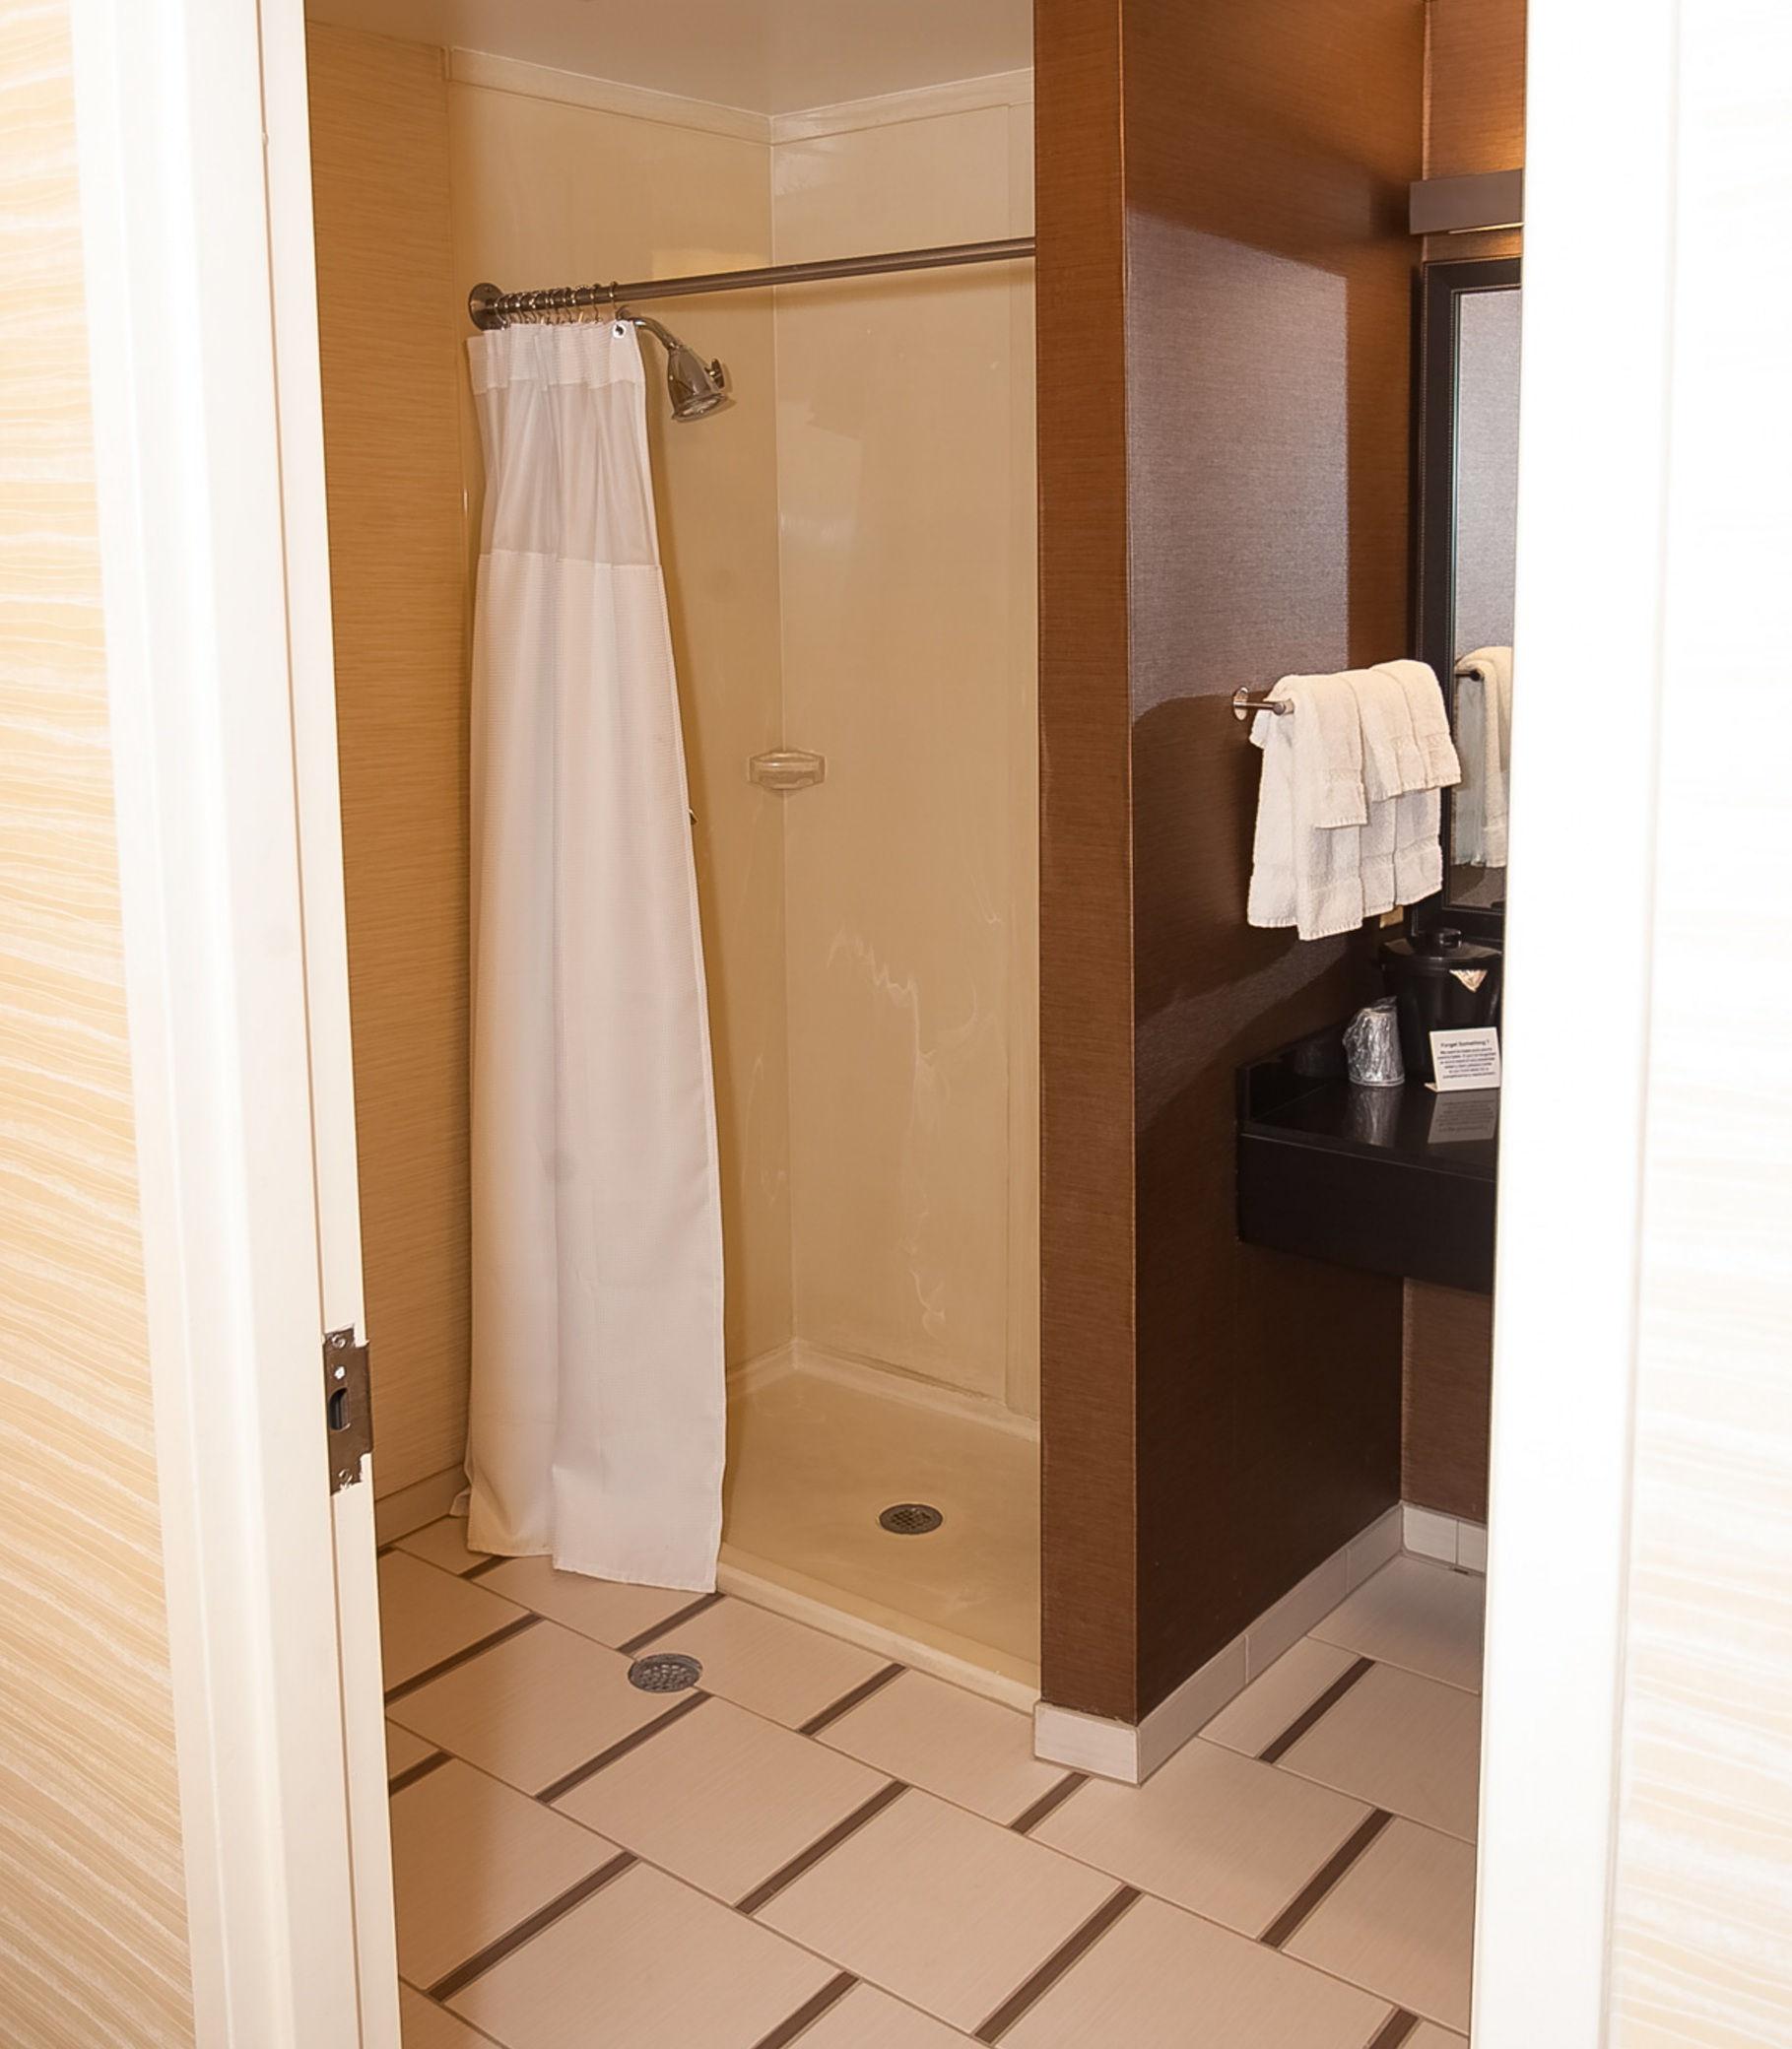 Fairfield Inn & Suites by Marriott Akron South image 0